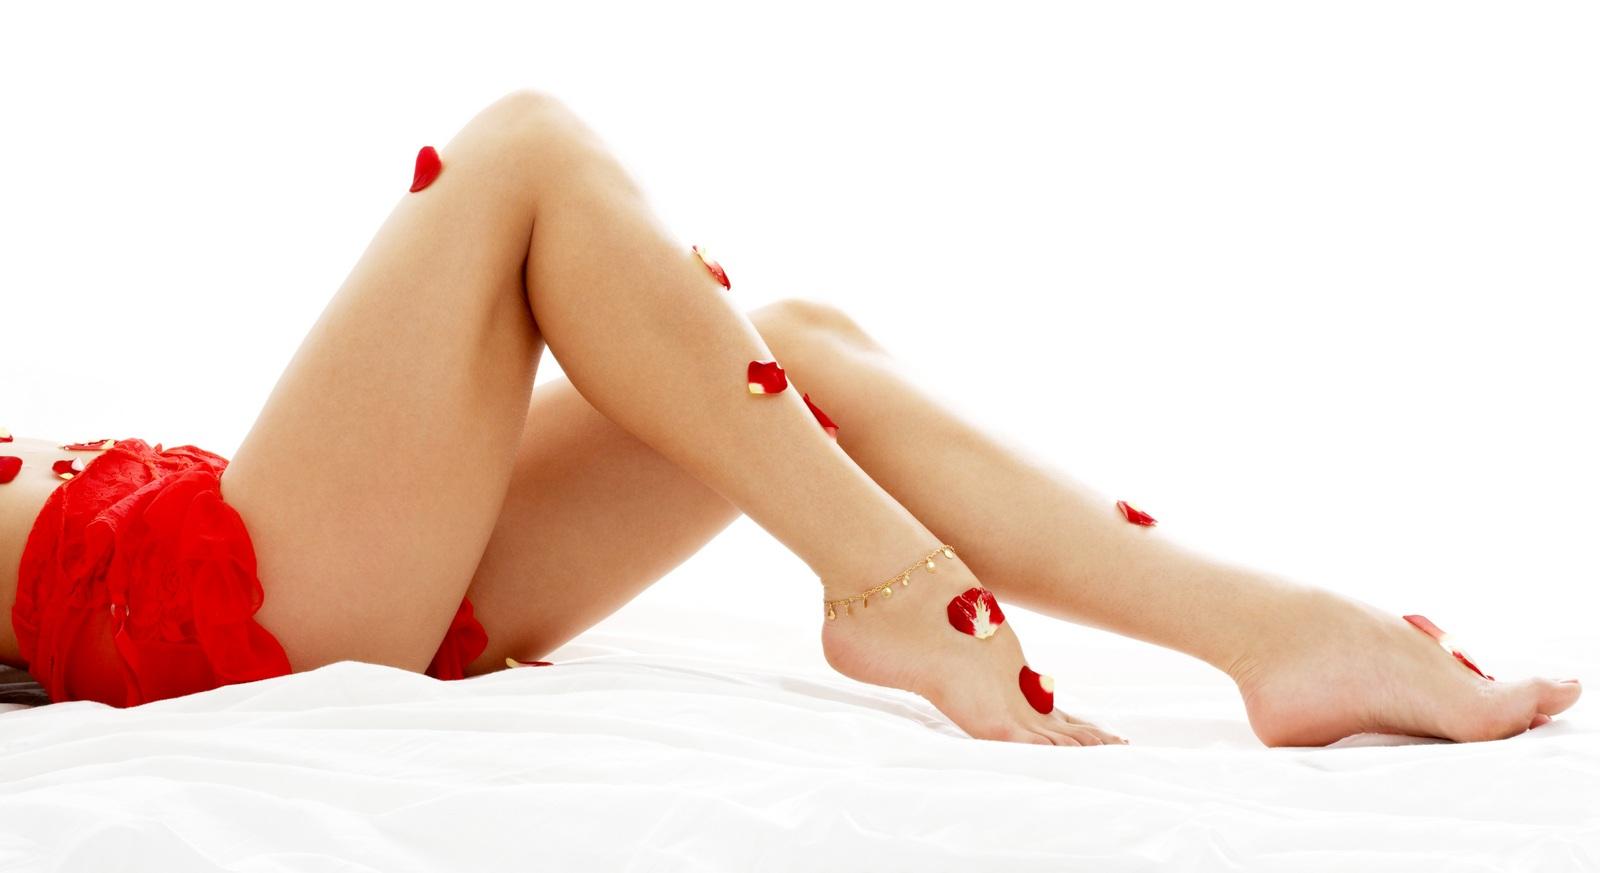 фото красота между ног